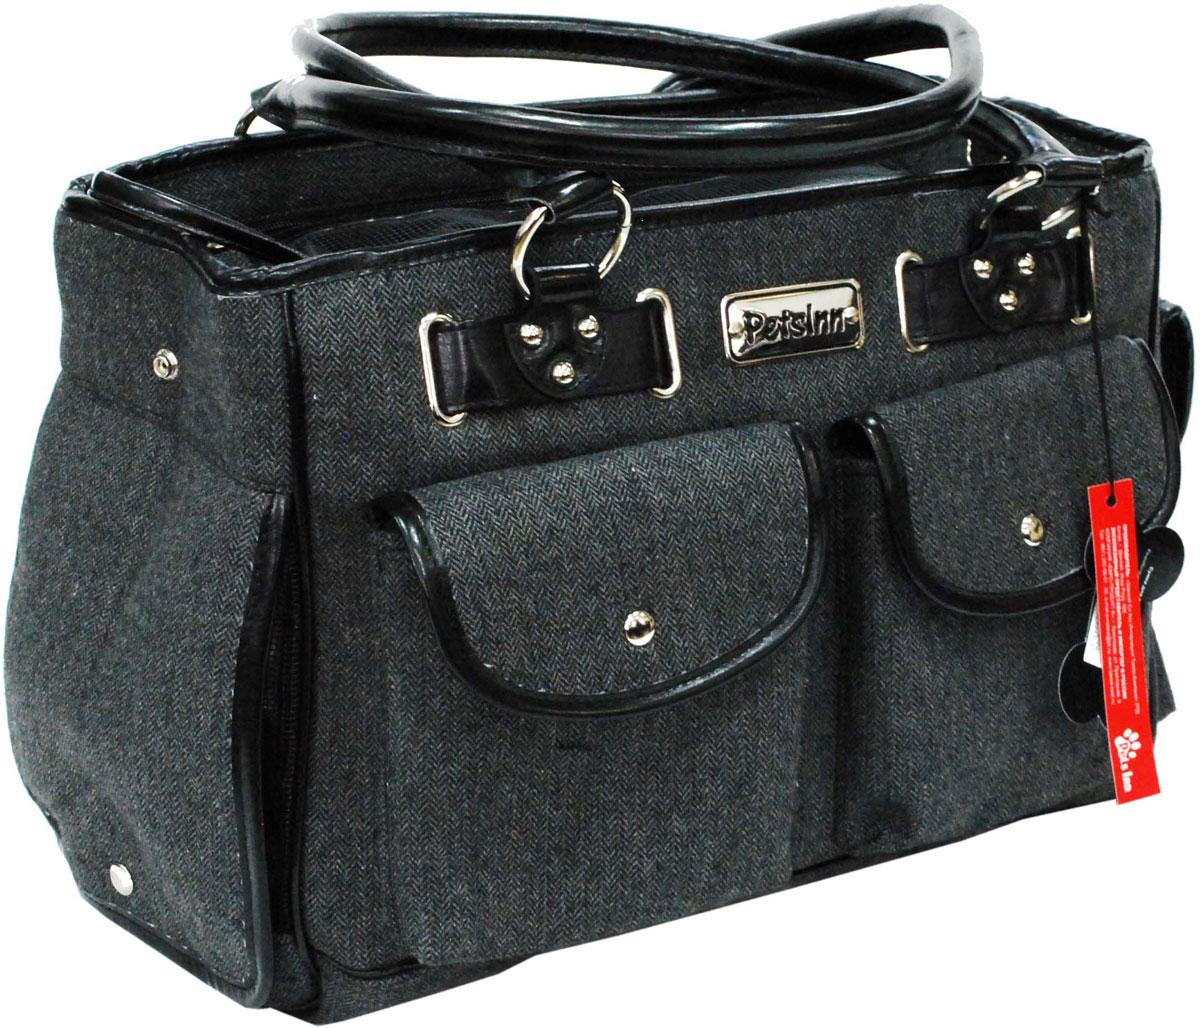 Сумка-переноска для животных Pets Inn, цвет: черный, темно-серый сумка переноска для животных pets inn цвет черный